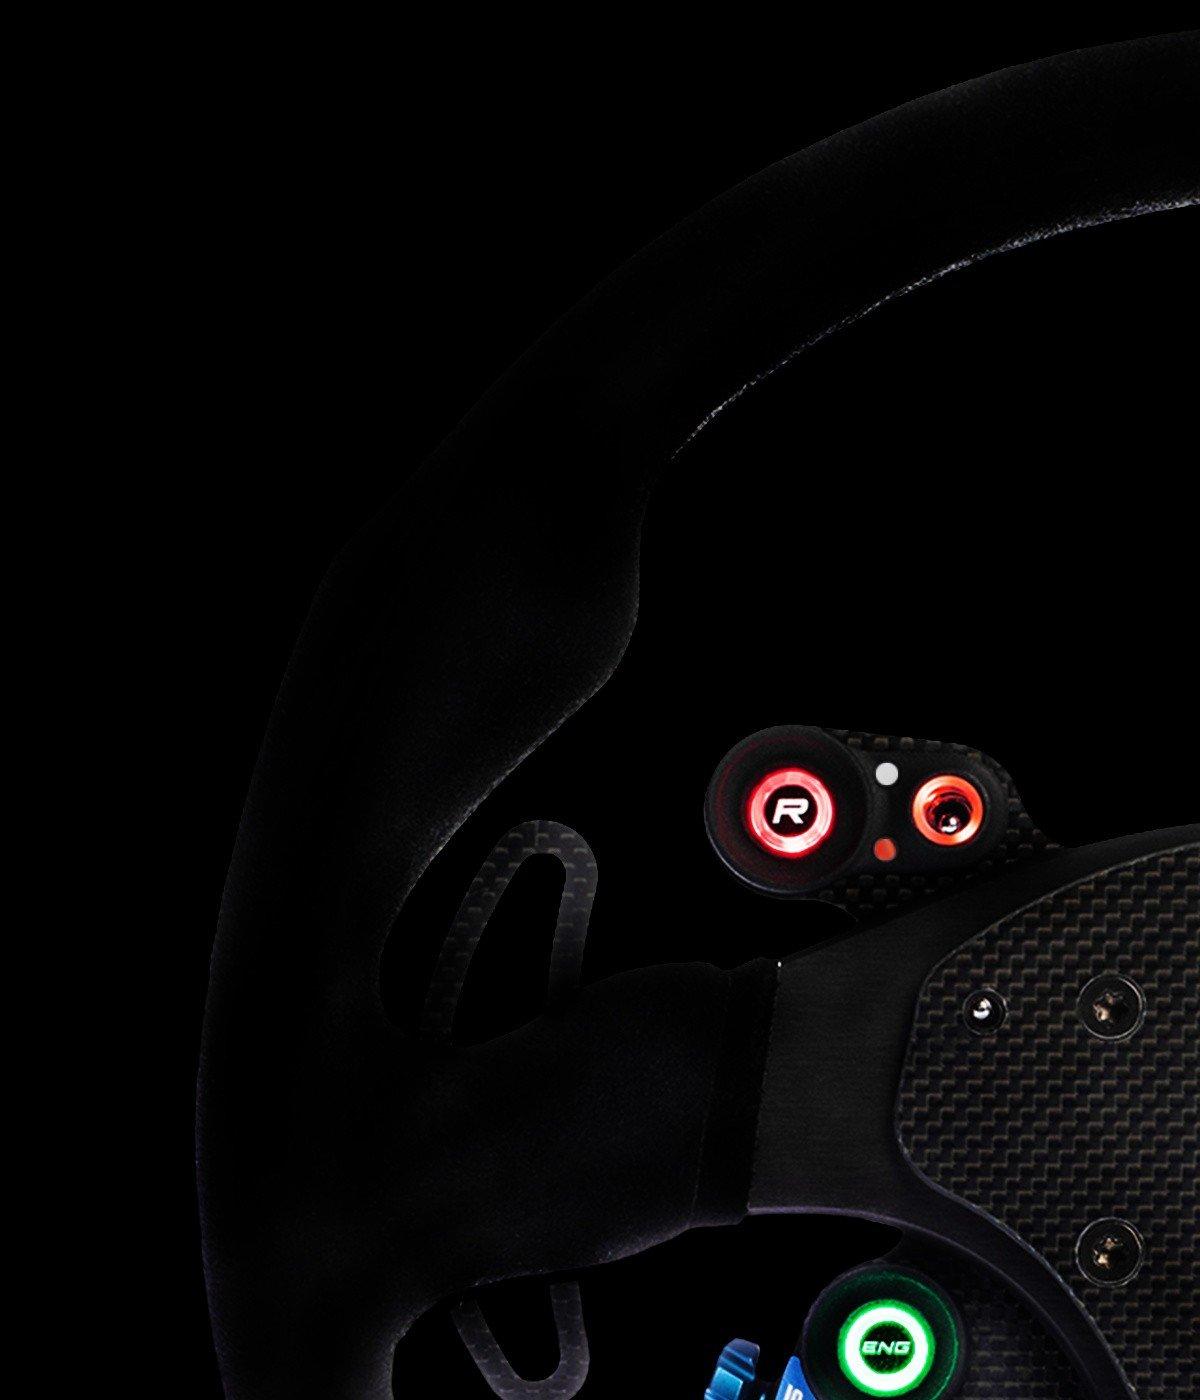 shop.gperformance.eu - Cube Controls GT Pro Sparco Wireless immersive backlit buttons - G-Perfomance